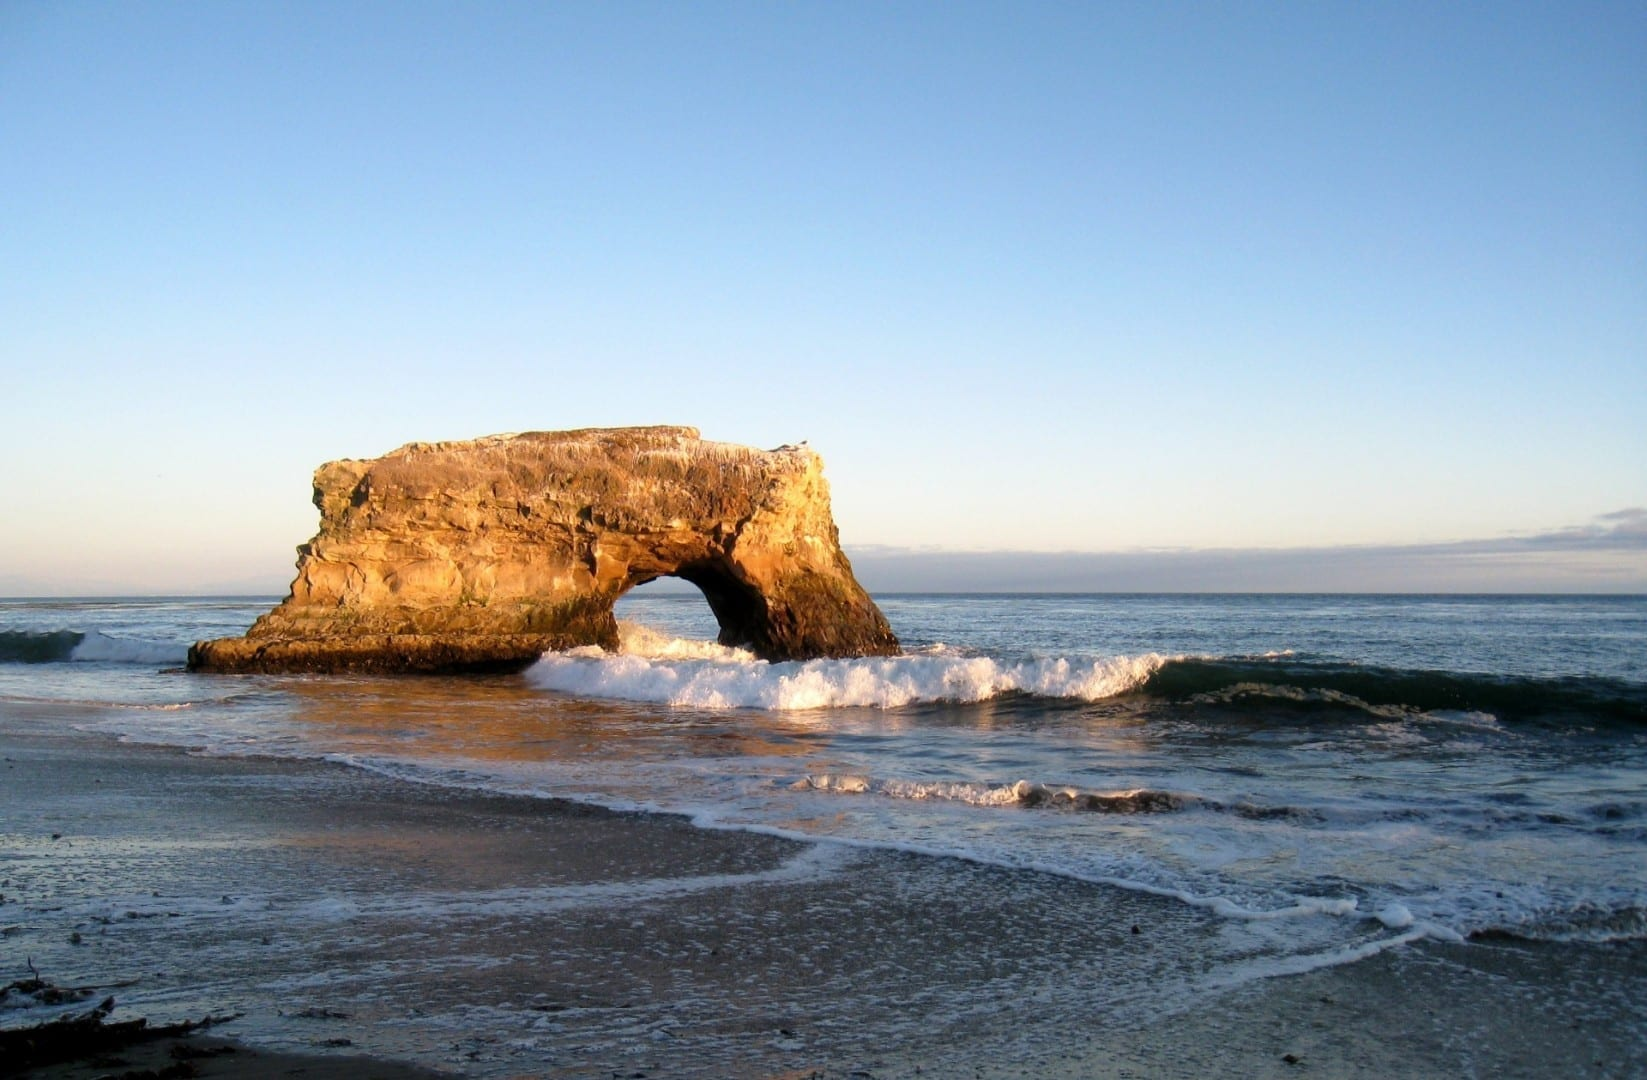 La playa estatal de Natural Bridges Santa Cruz CA Estados Unidos